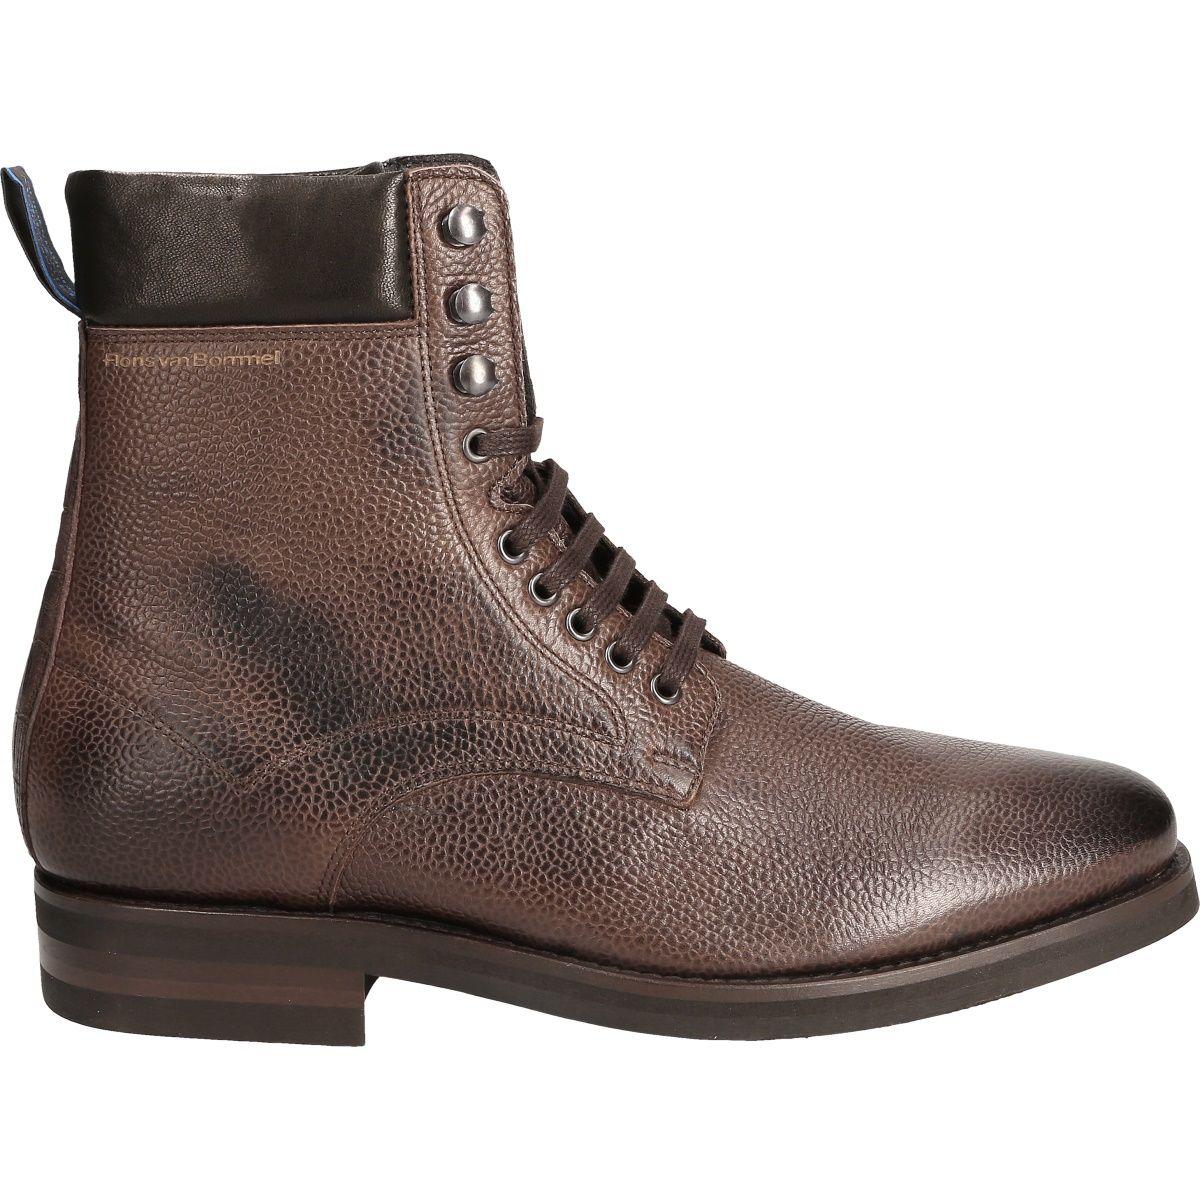 Floris Boots 1065800 Im Van Schuhe Lüke Herrenschuhe Online Bommel 8ywmN0Ovn